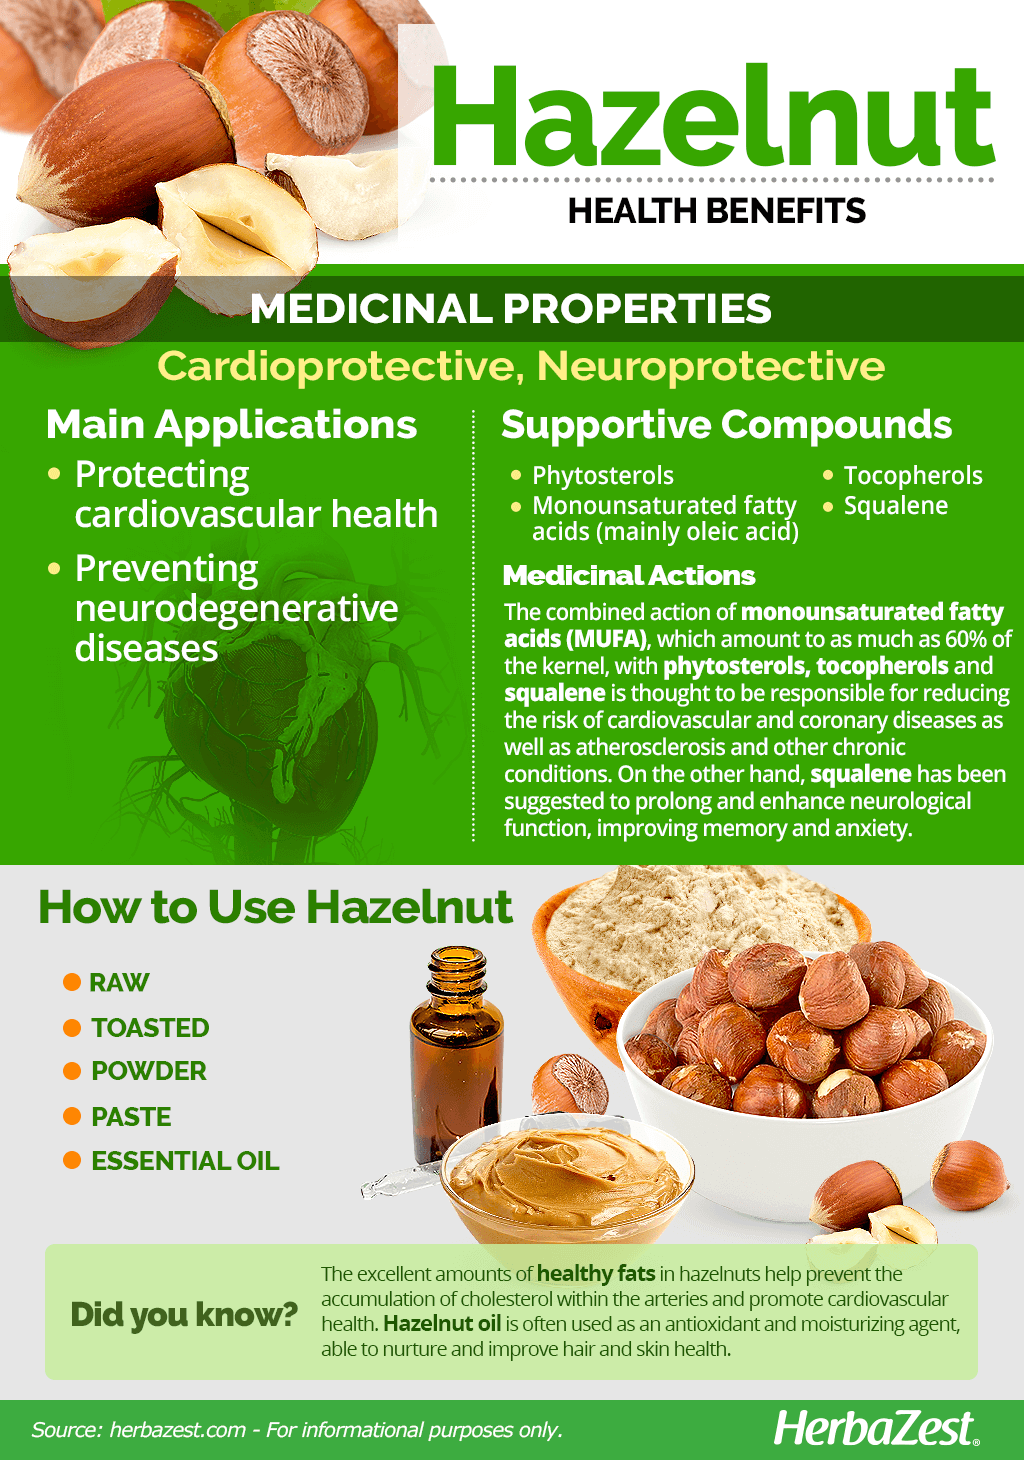 All About Hazelnut